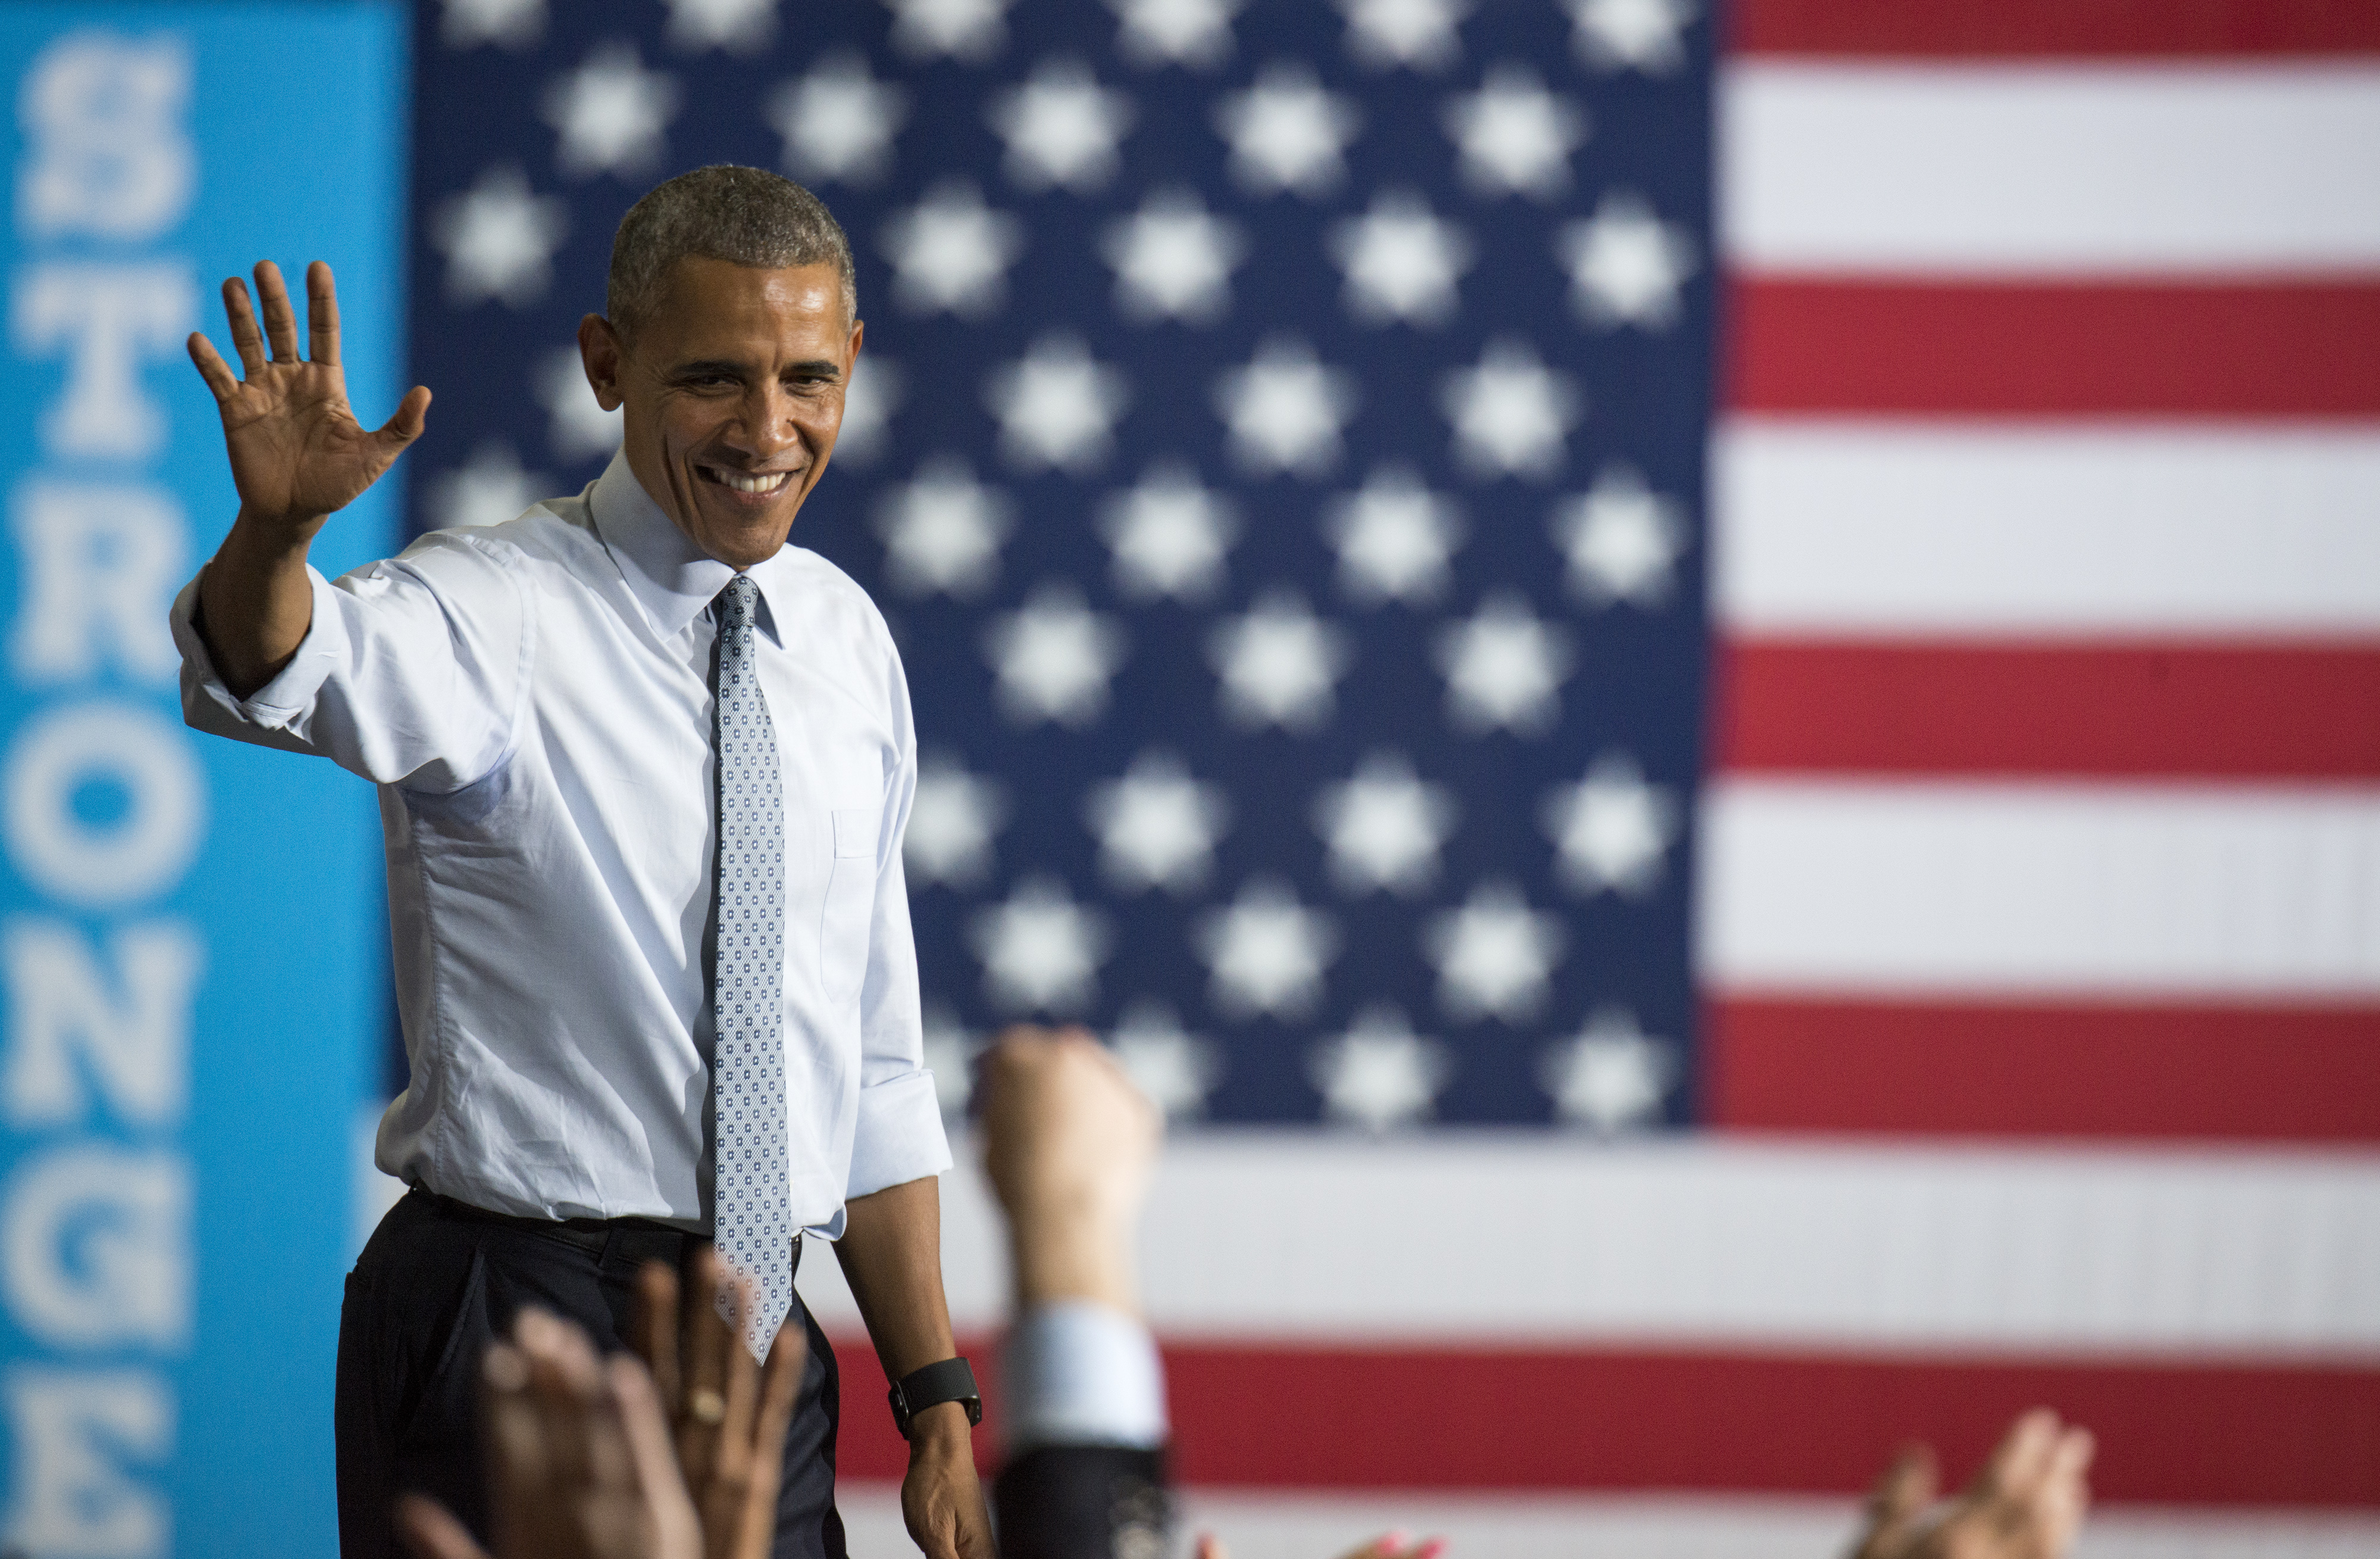 Barack Obama Talks to Black Voters in Radio Interview | Time